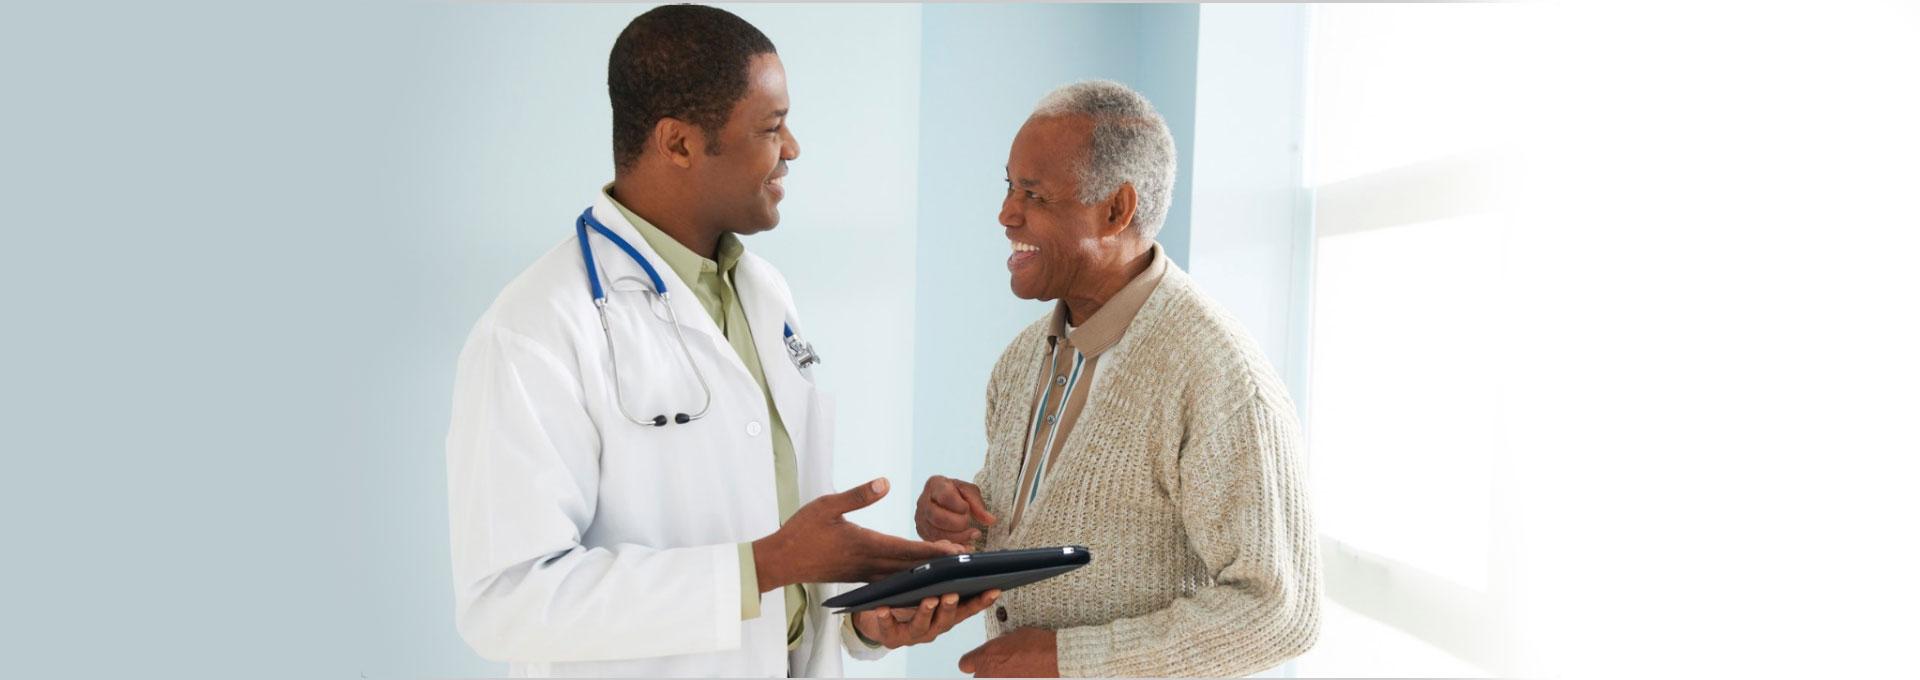 free clinics free medical clinics free health clinics